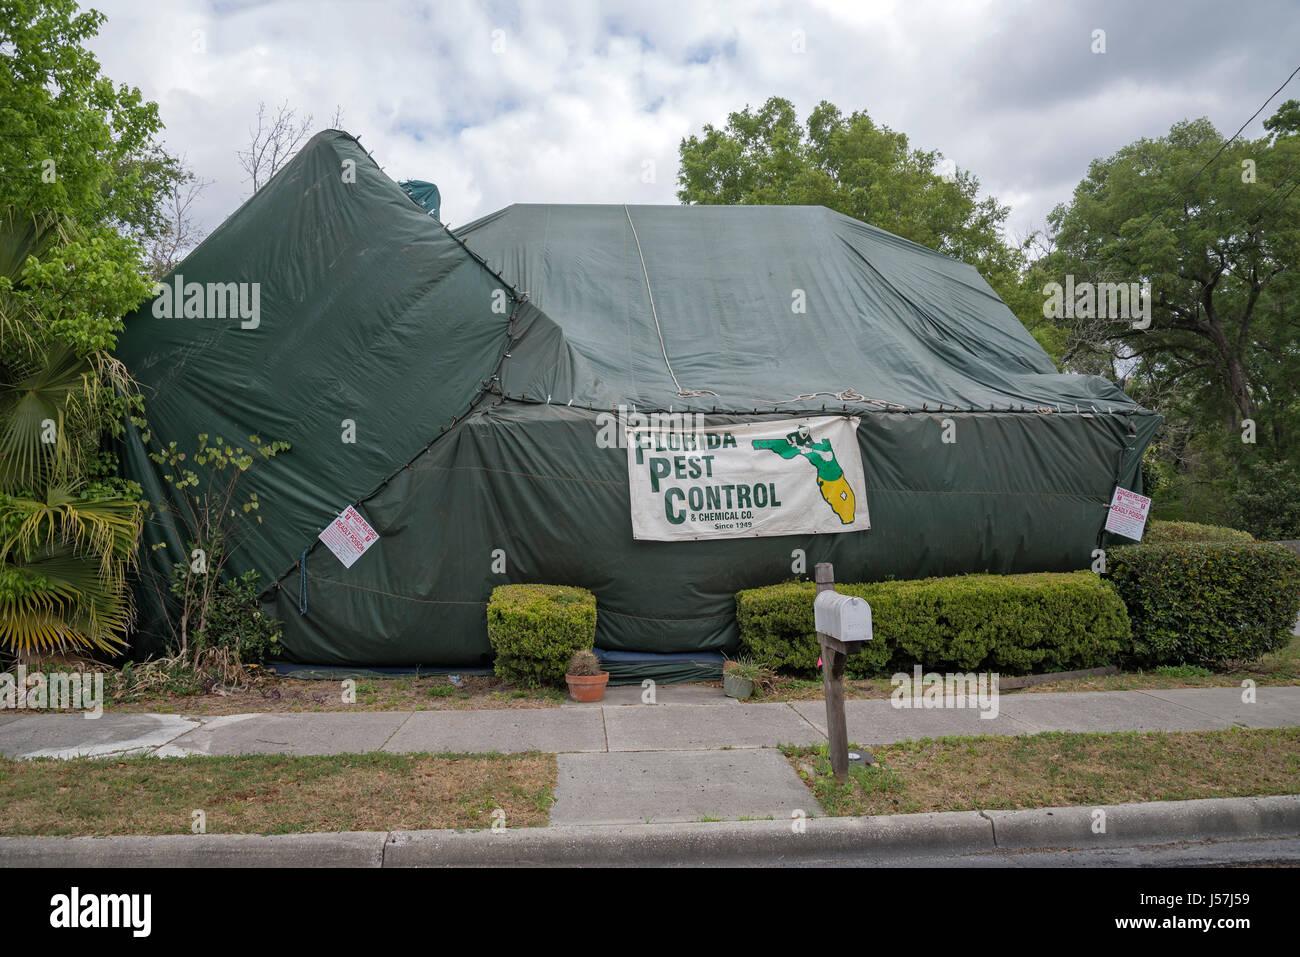 Tent fumigation of home & Tent fumigation of home Stock Photo Royalty Free Image: 140924149 ...